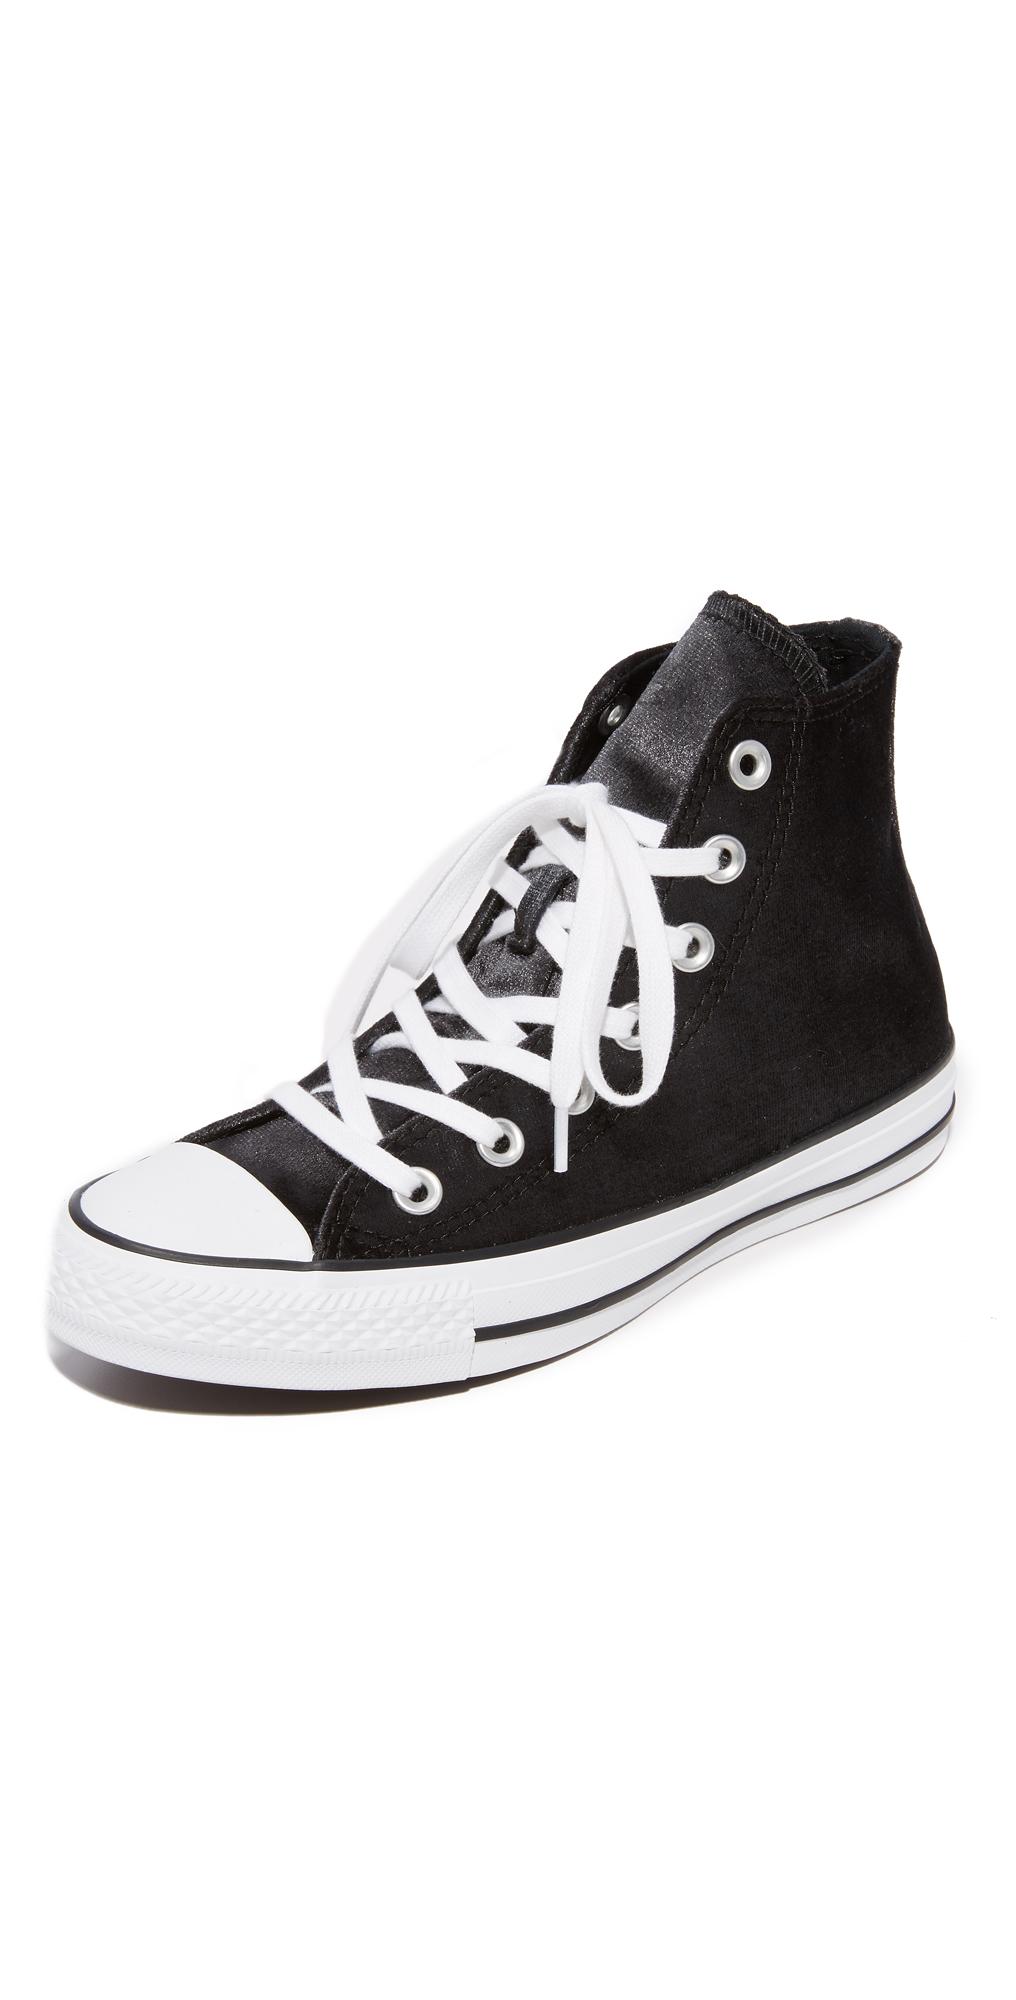 Chuck Taylor All Star Velvet High Top Sneakers Converse